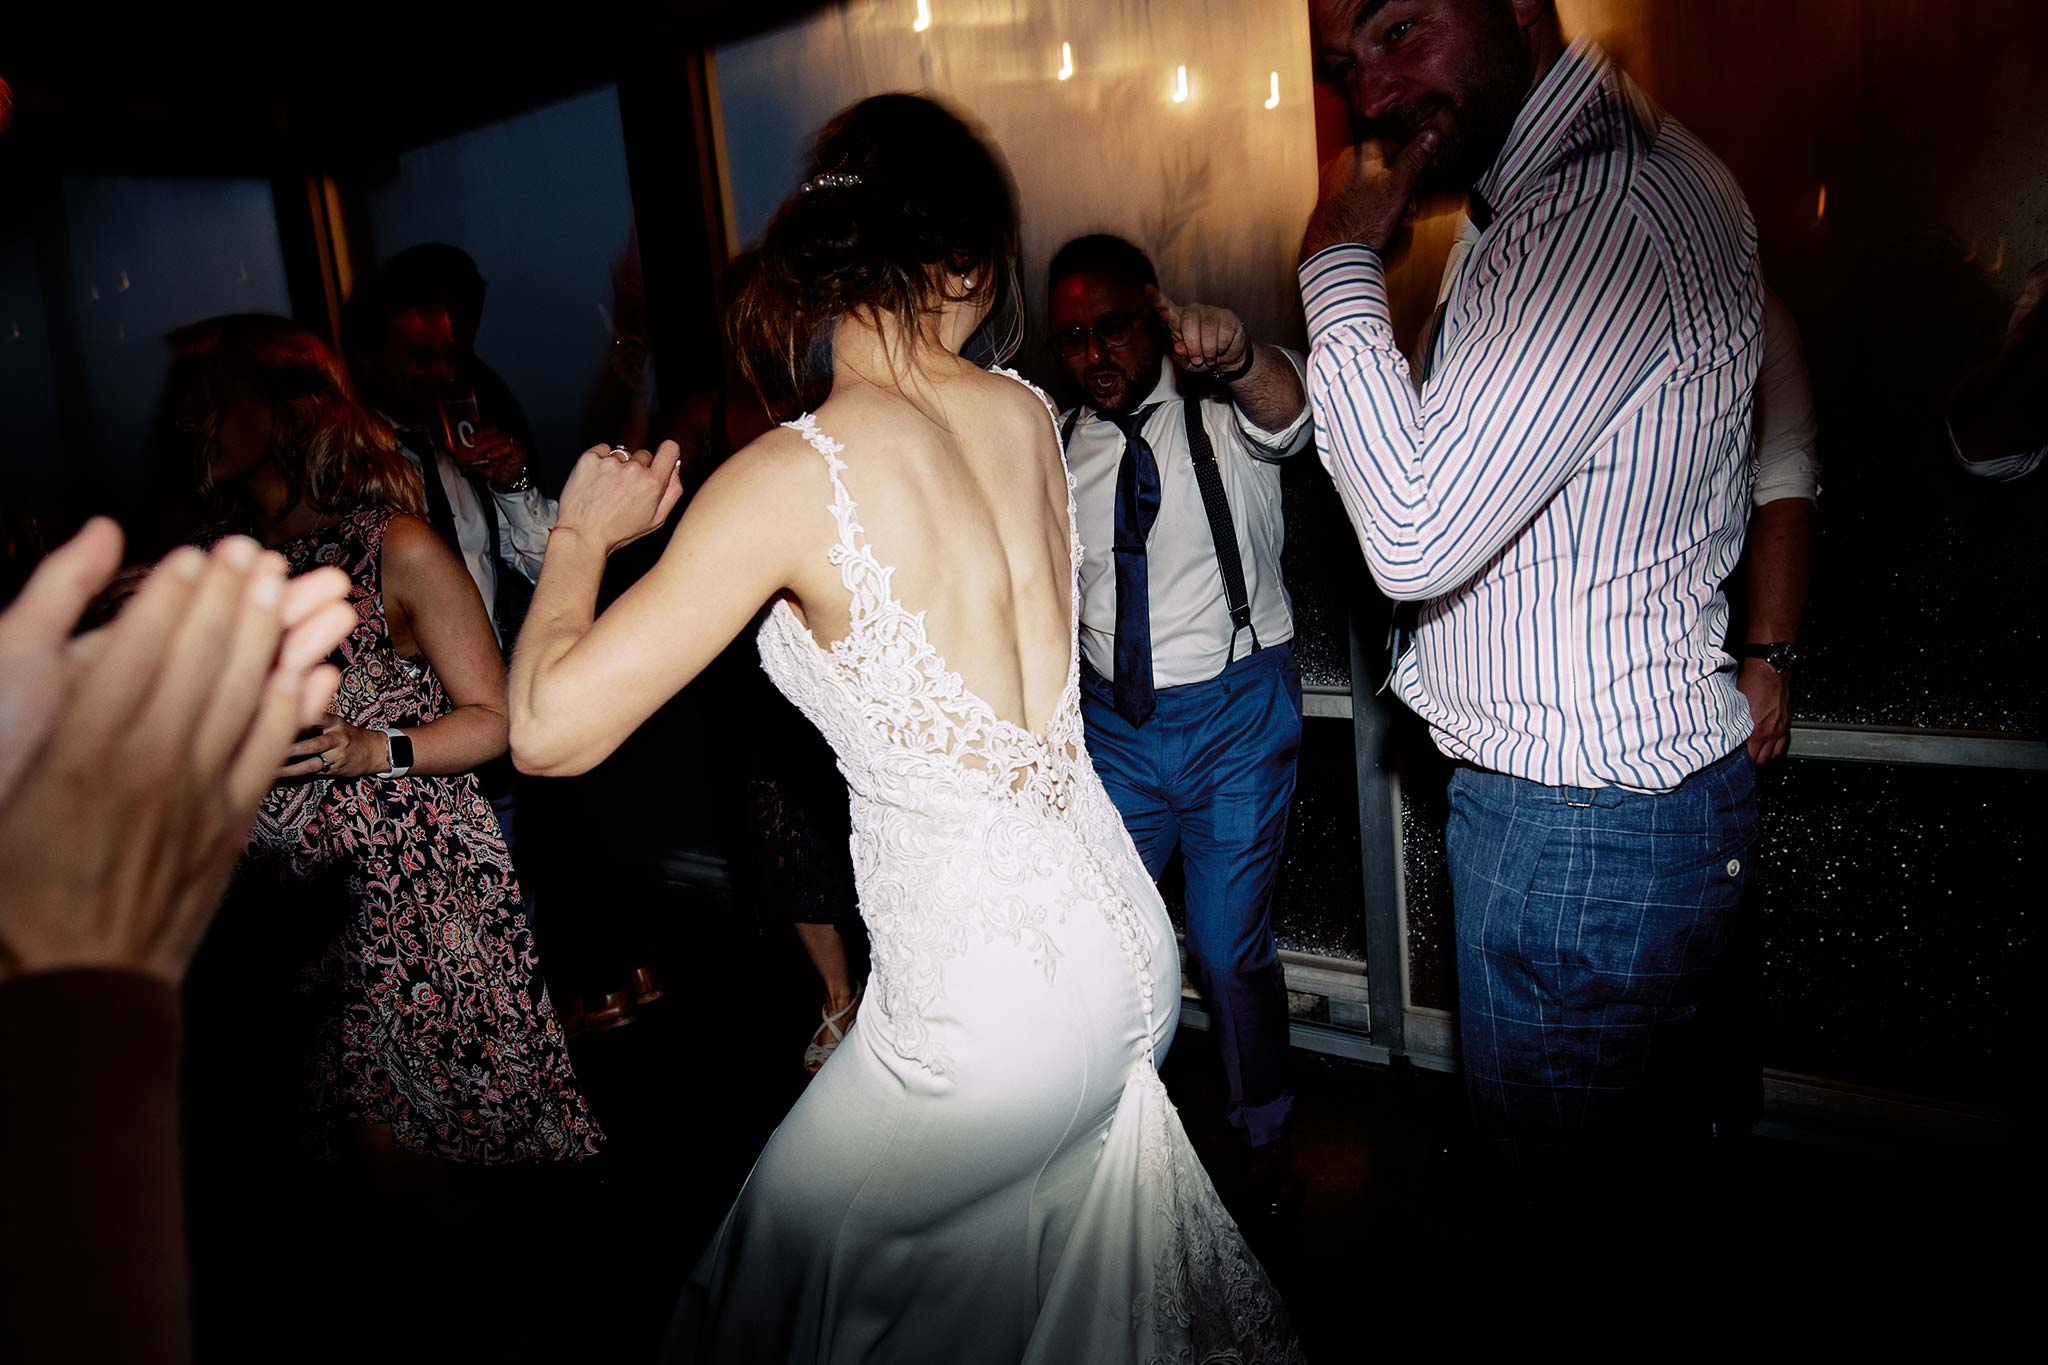 zonzo wedding photography reception dance floor bride back view